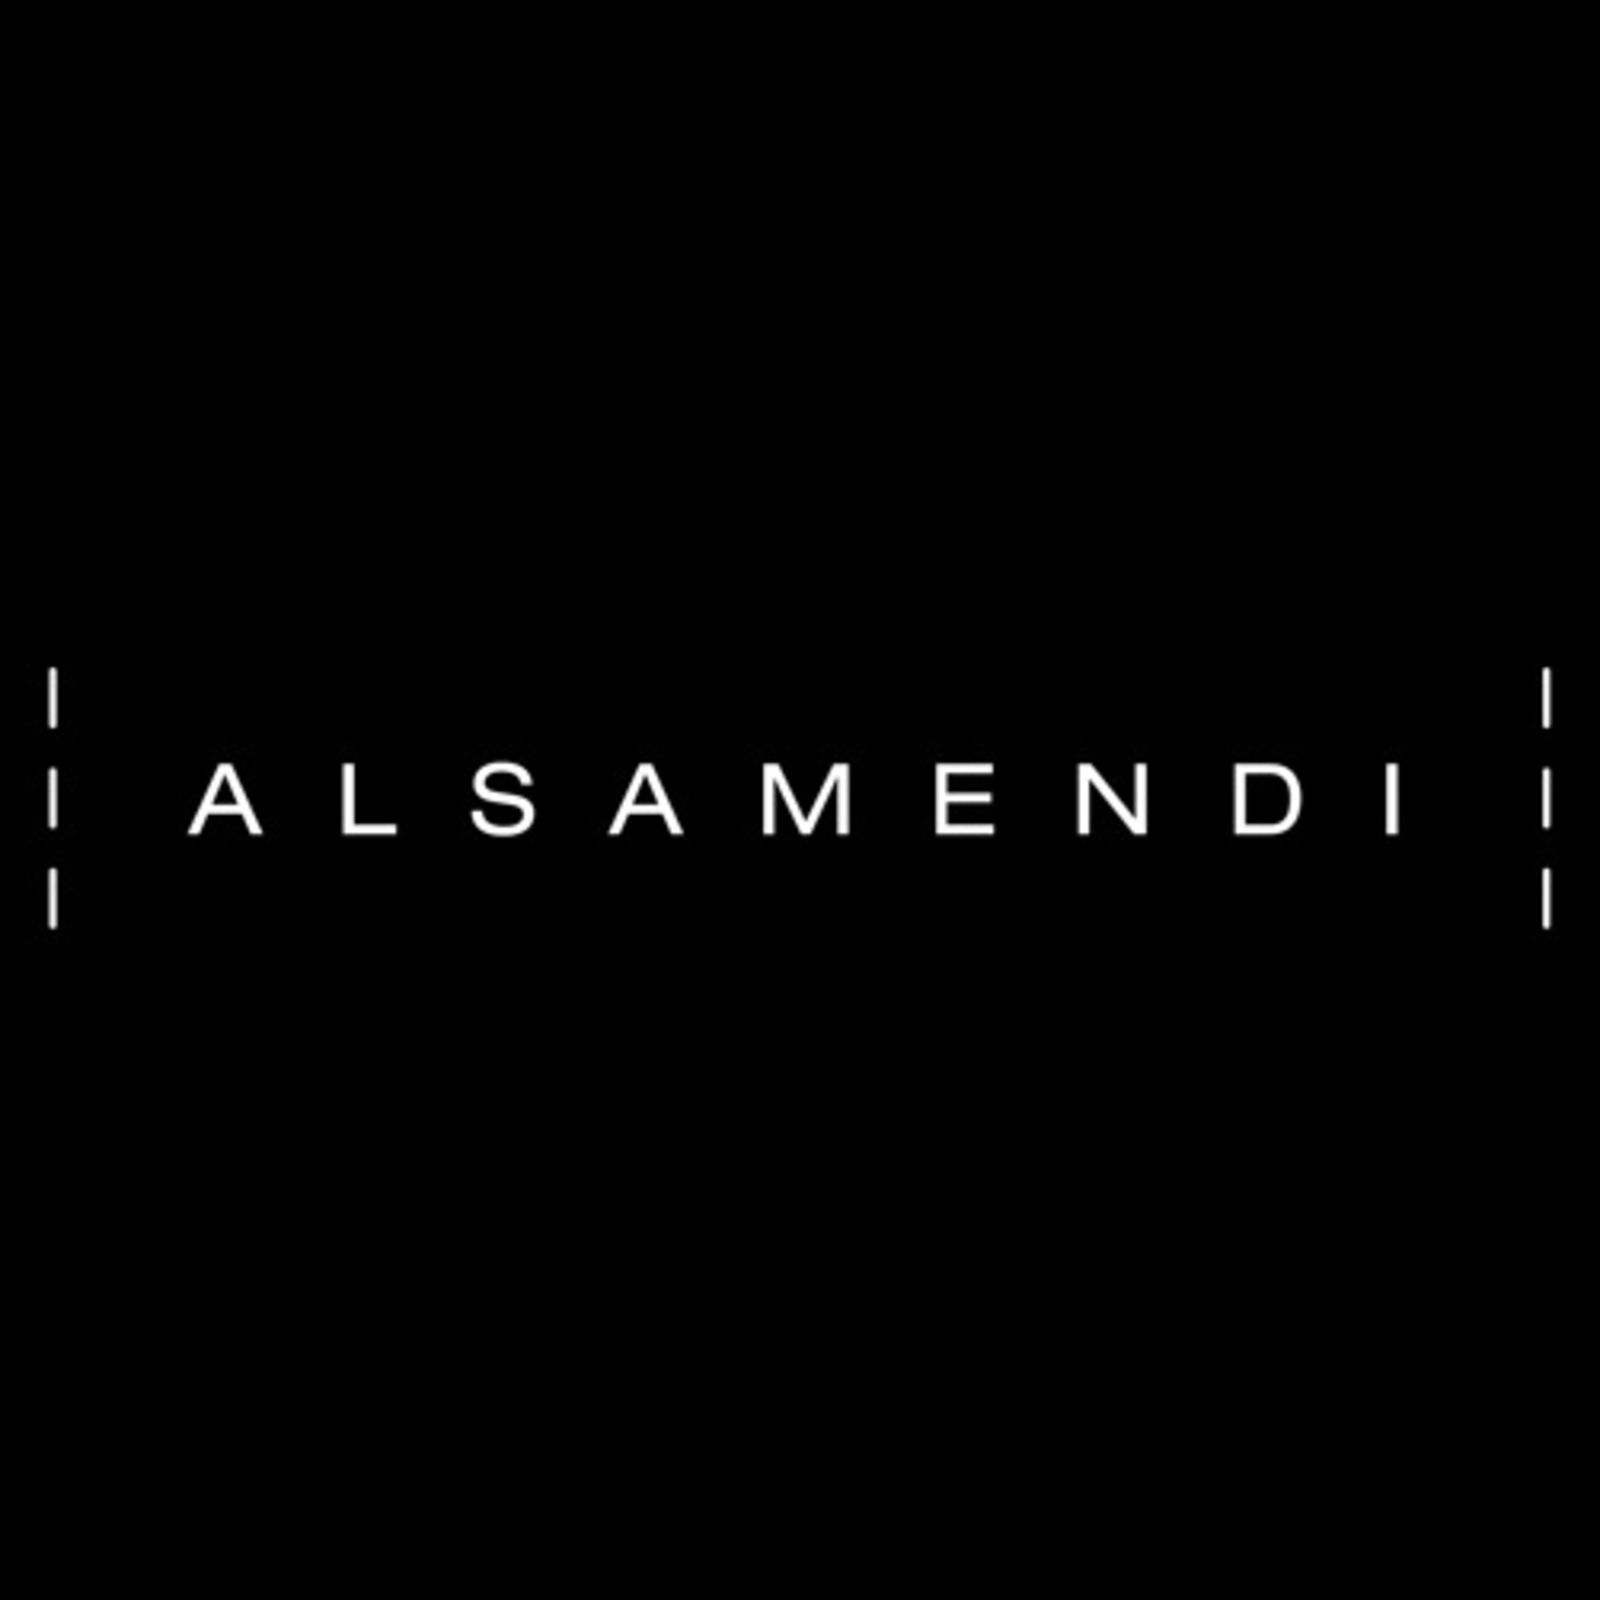 ALSAMENDI (Bild 1)